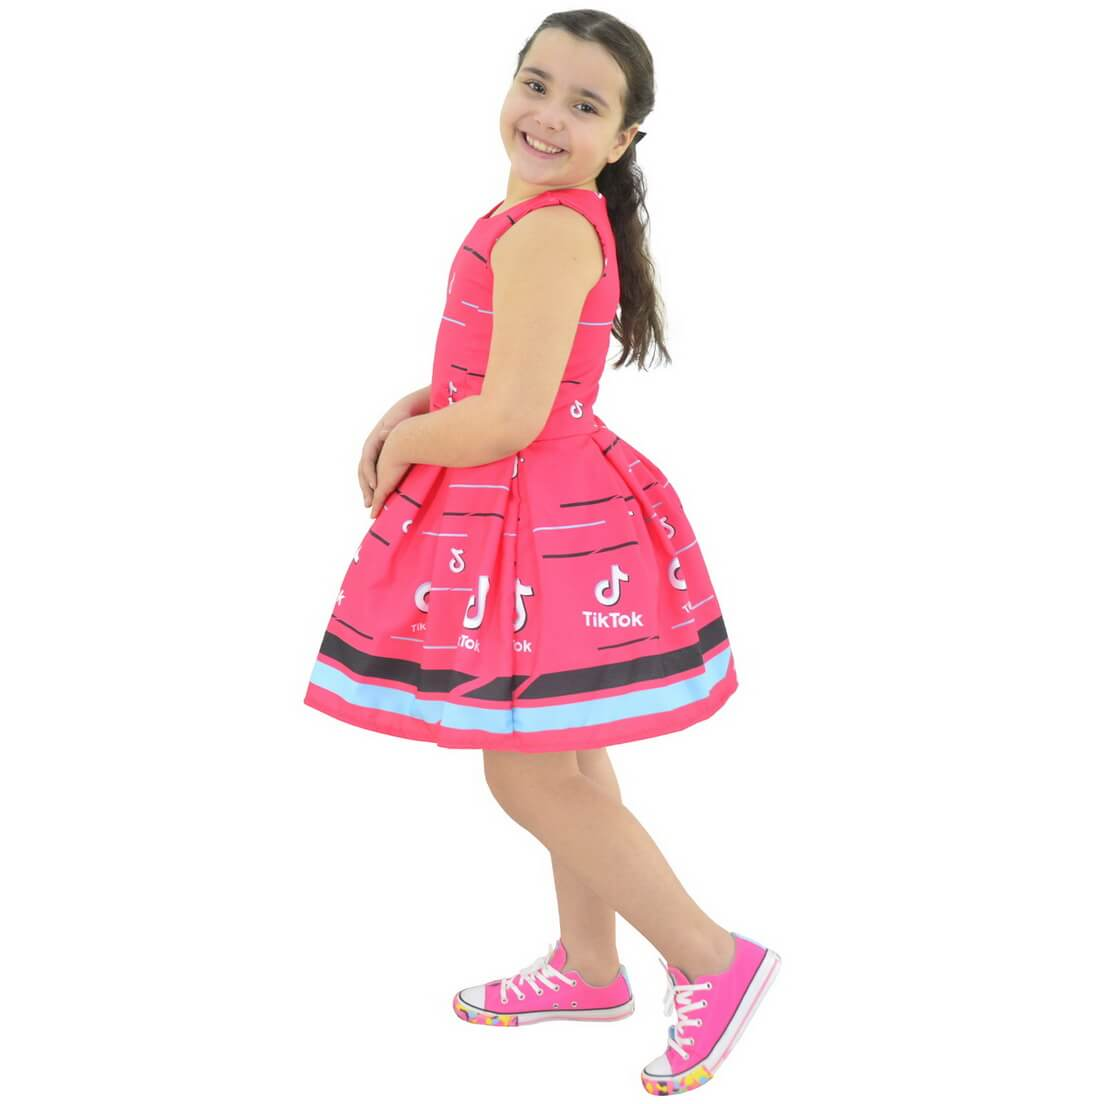 Vestido infantil Tik Tok Rosa - TikTok